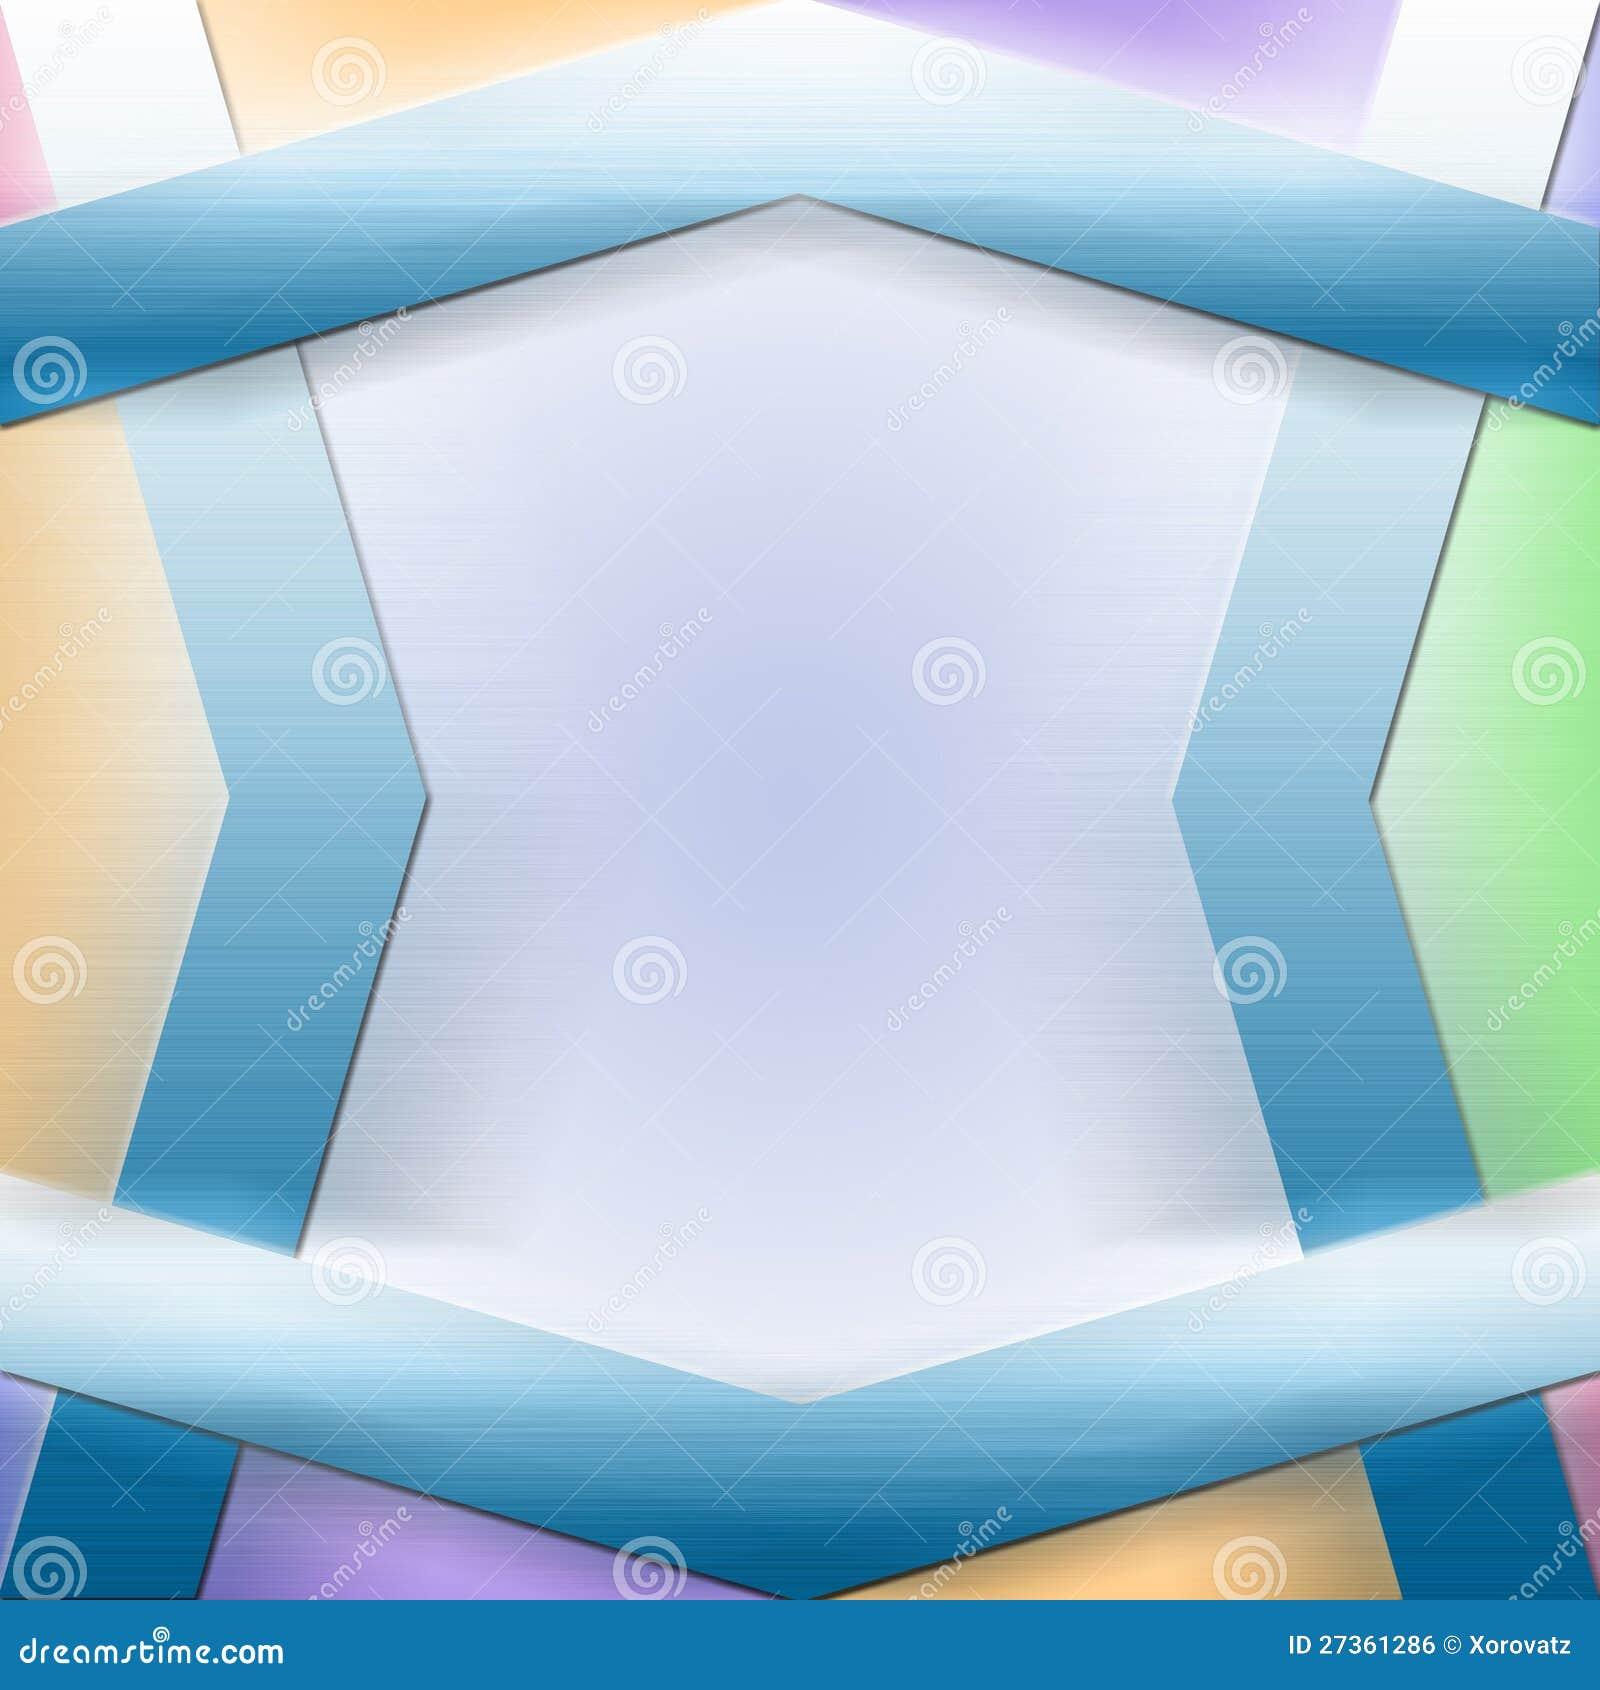 shapes design advertisement background royalty free stock image